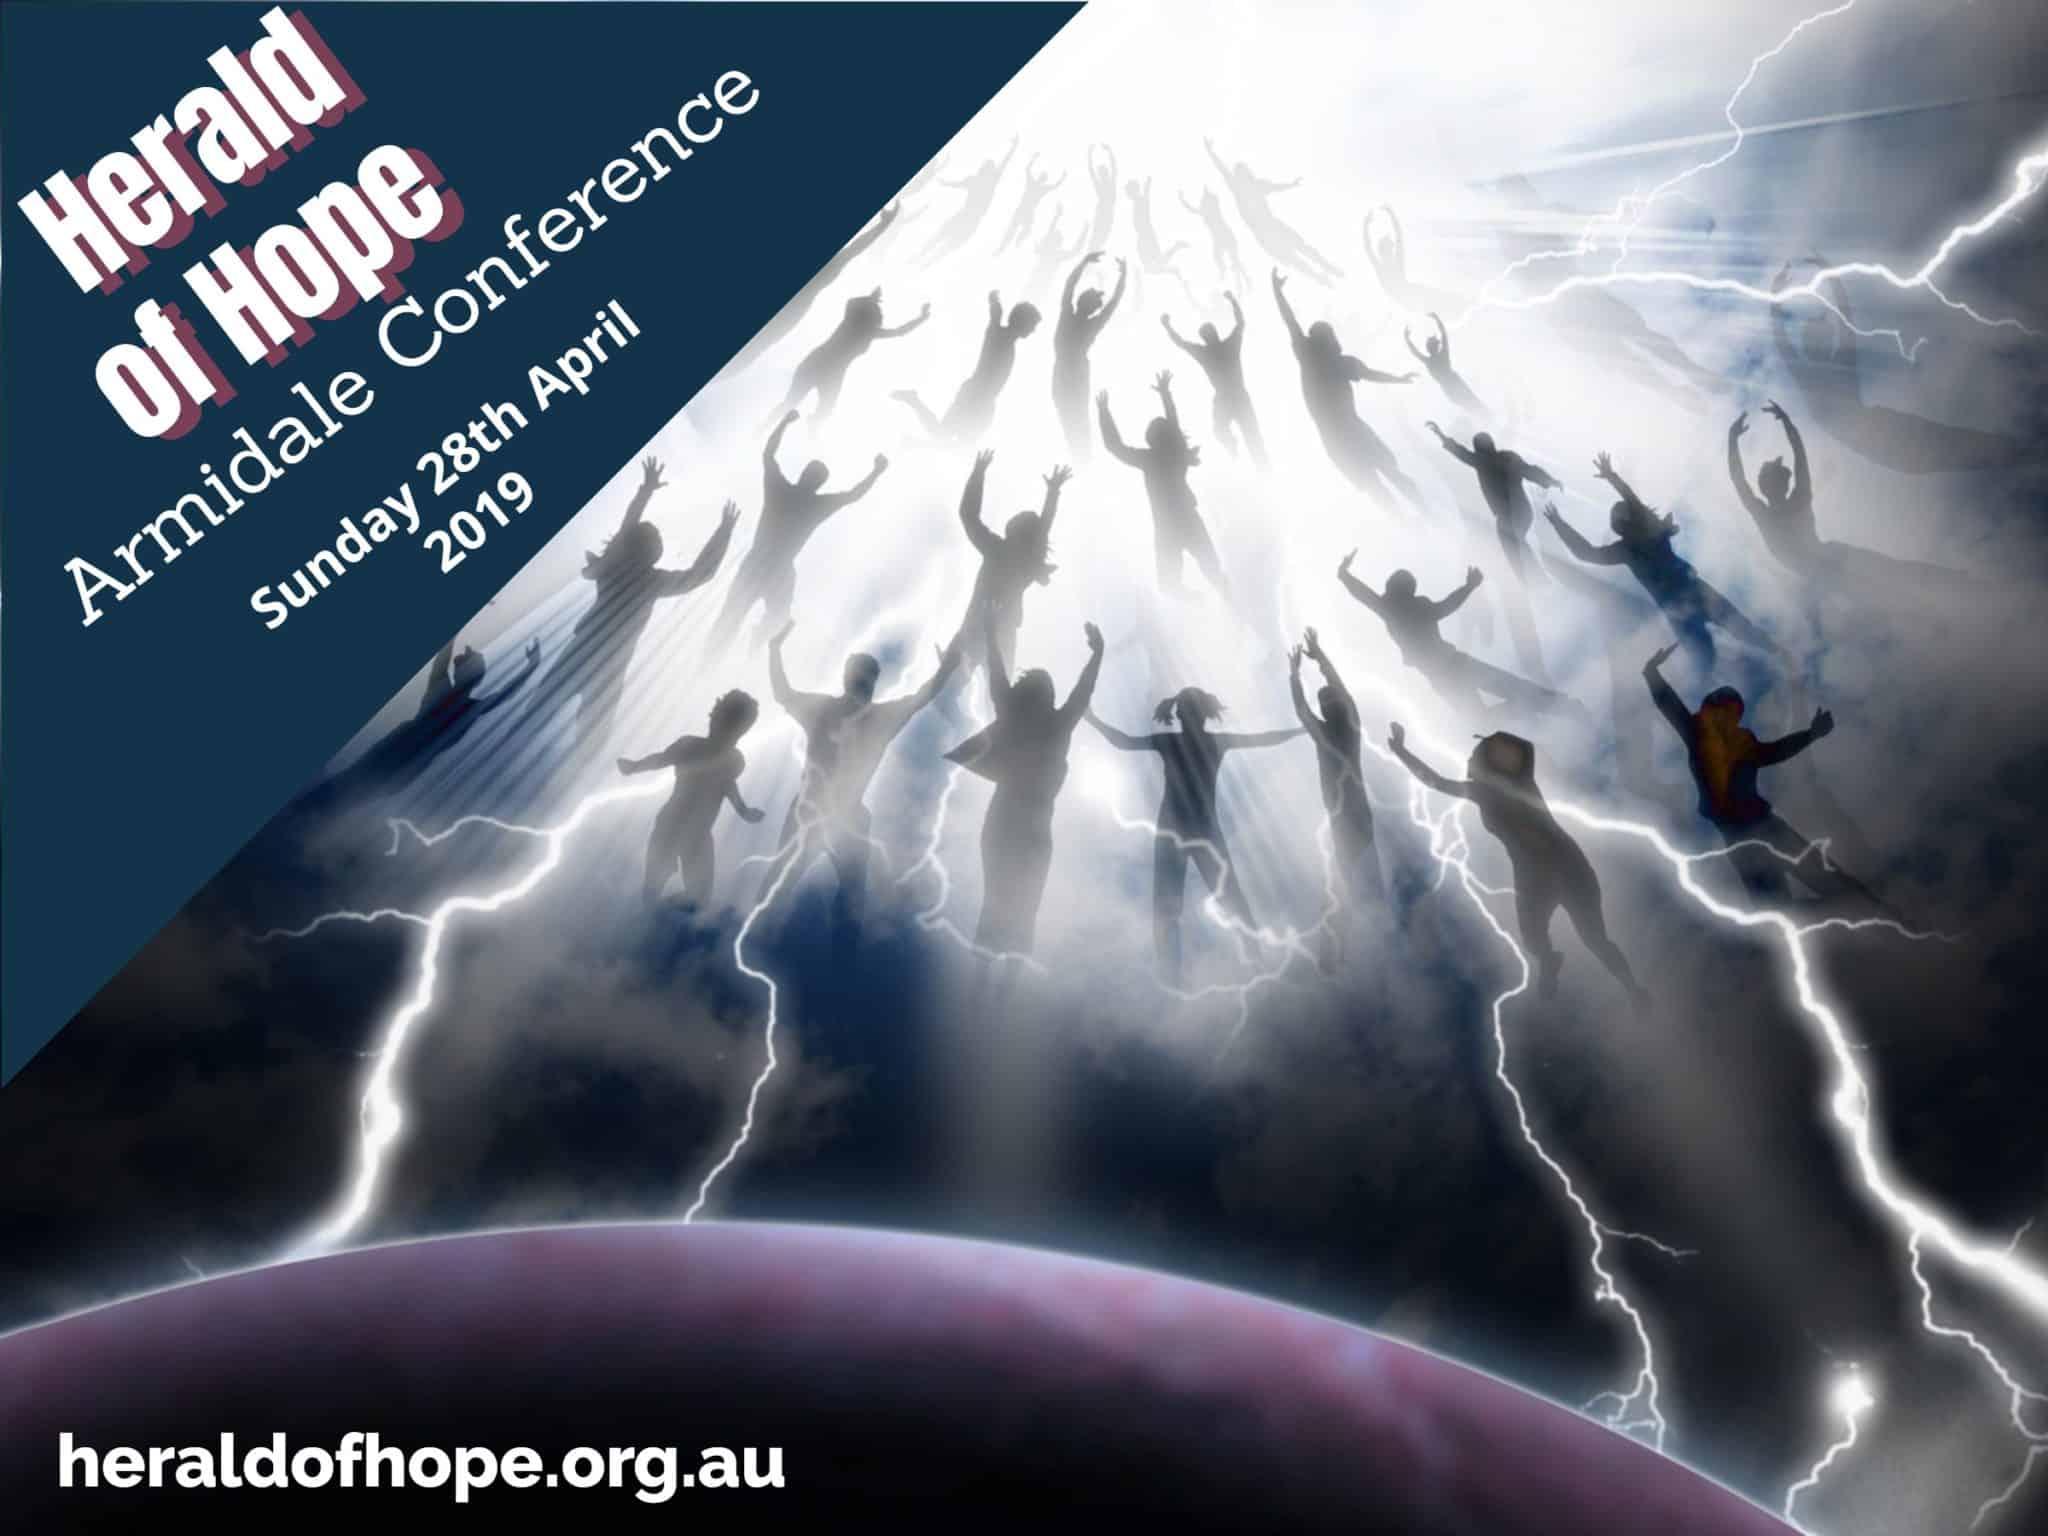 Armidale Rapture Conference 2019